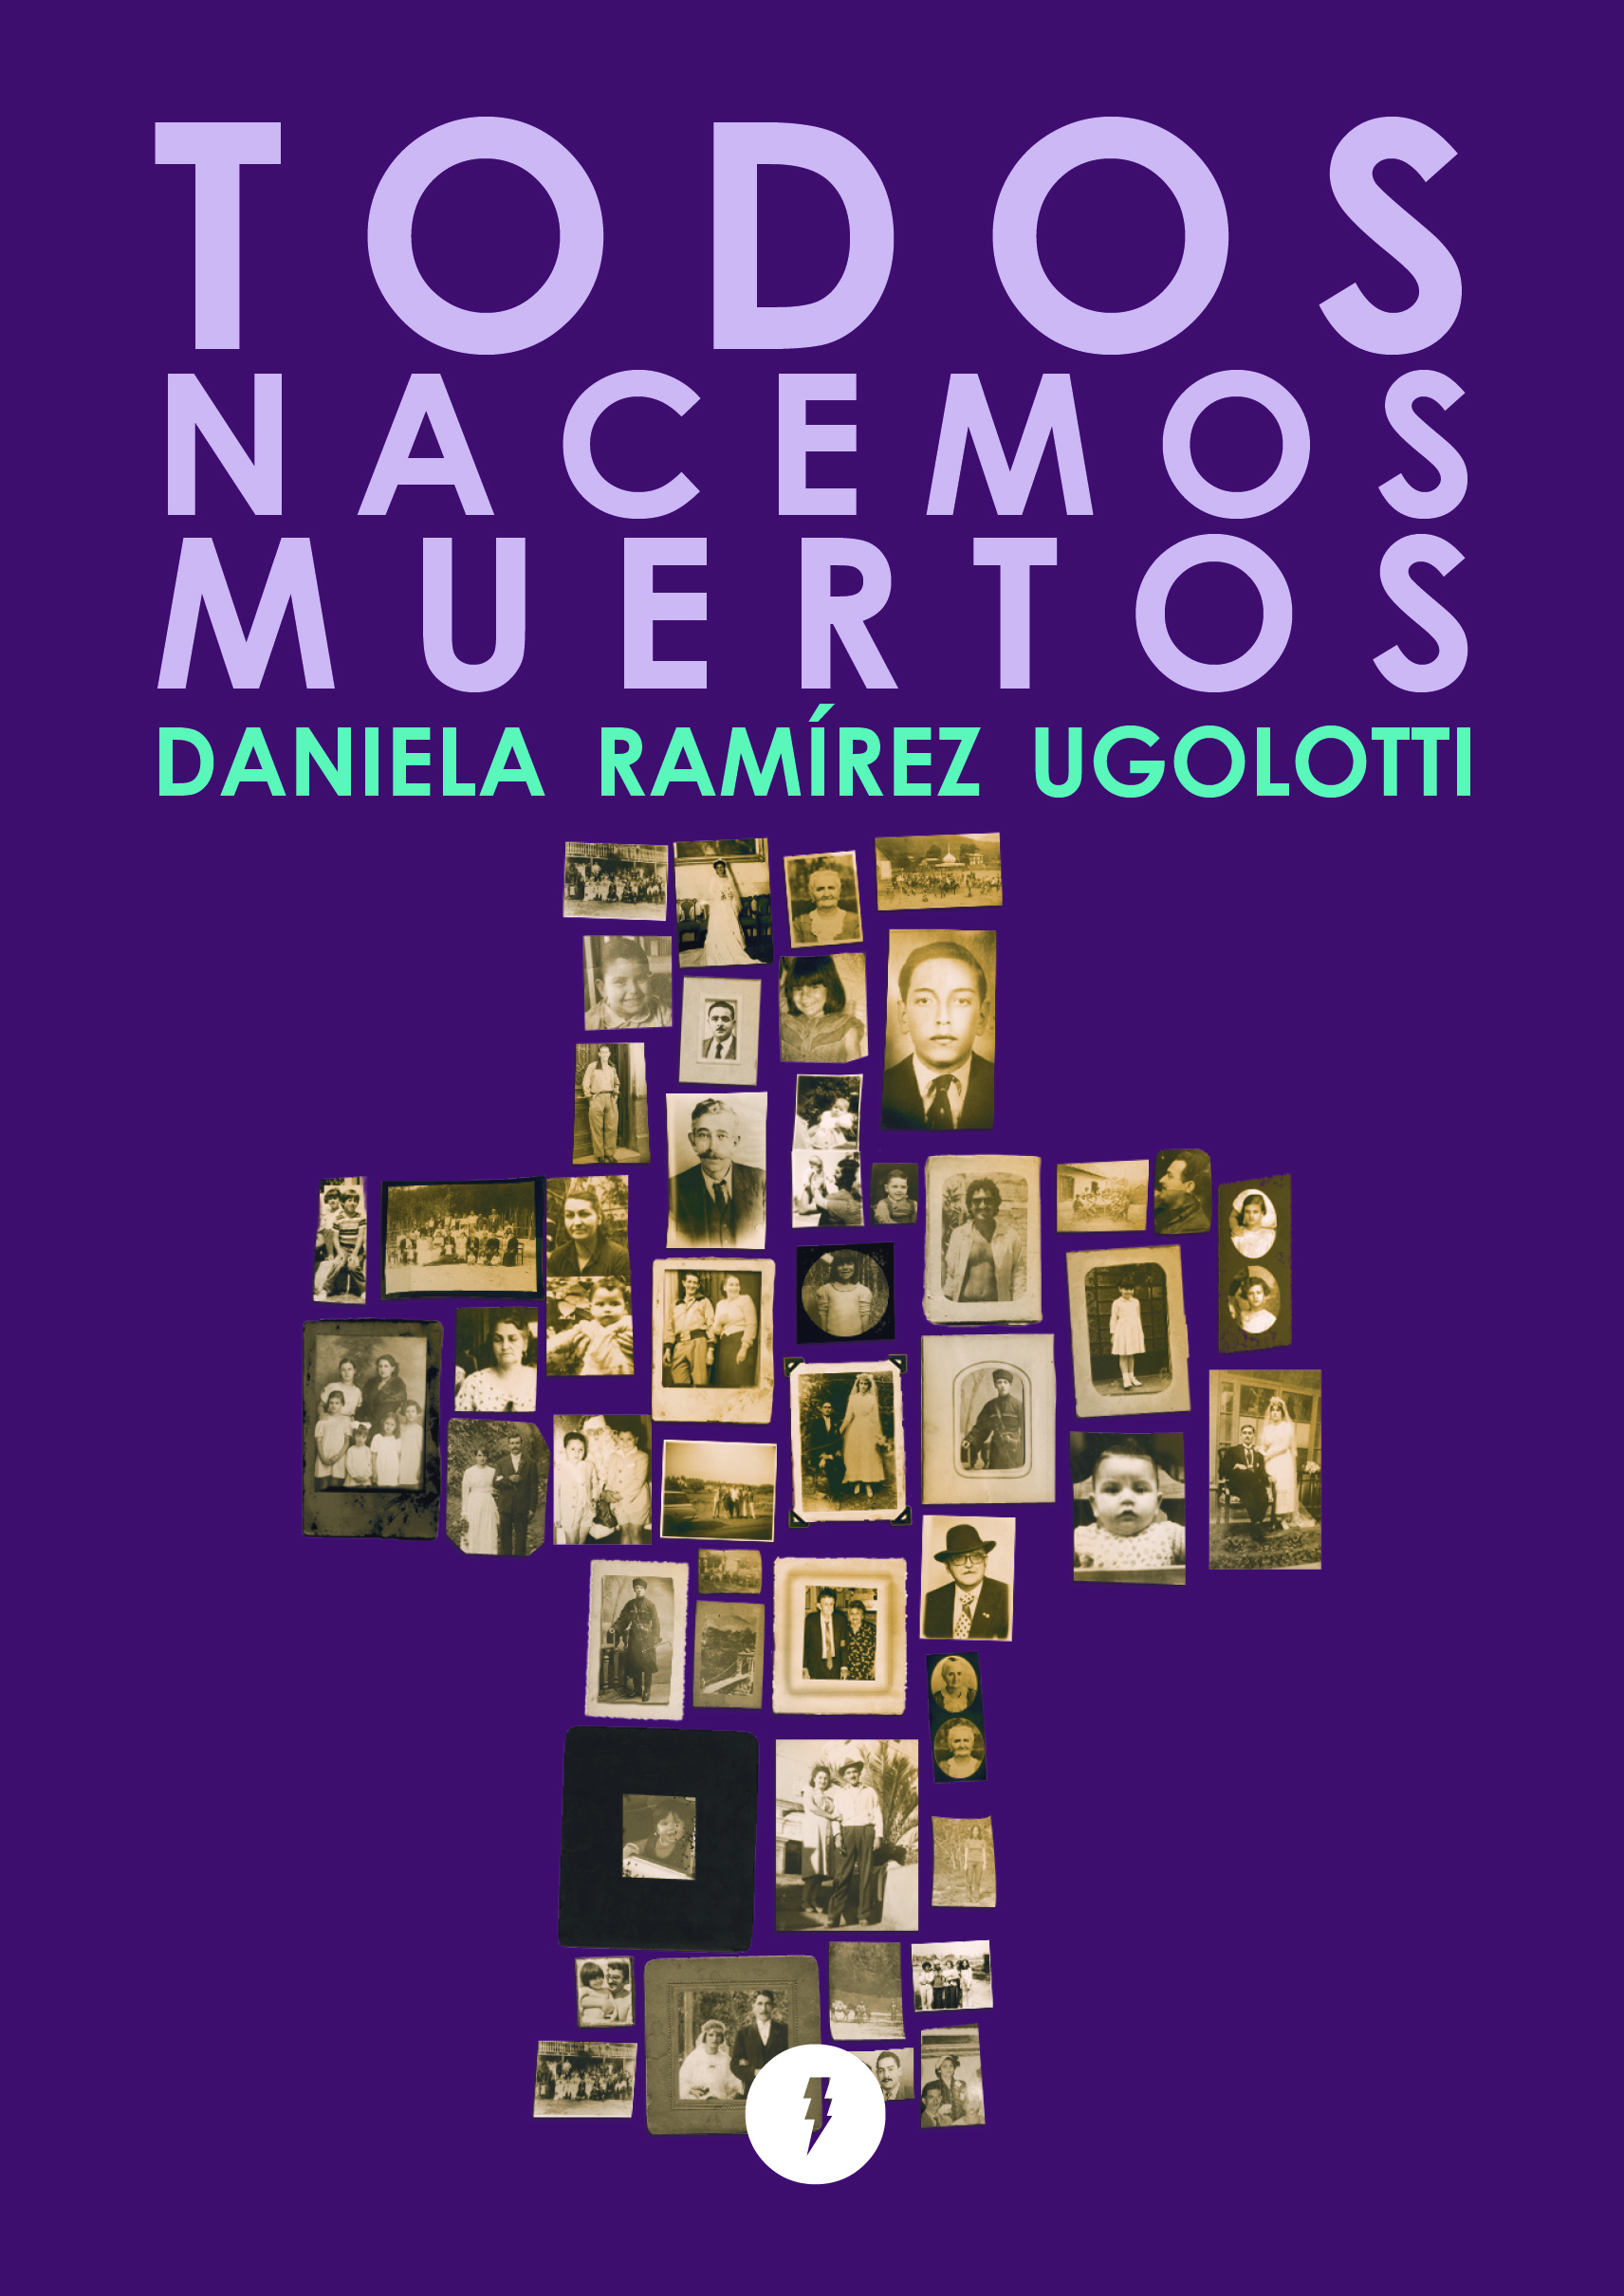 TODOS NACEMOS MUERTOS - PORTADA2